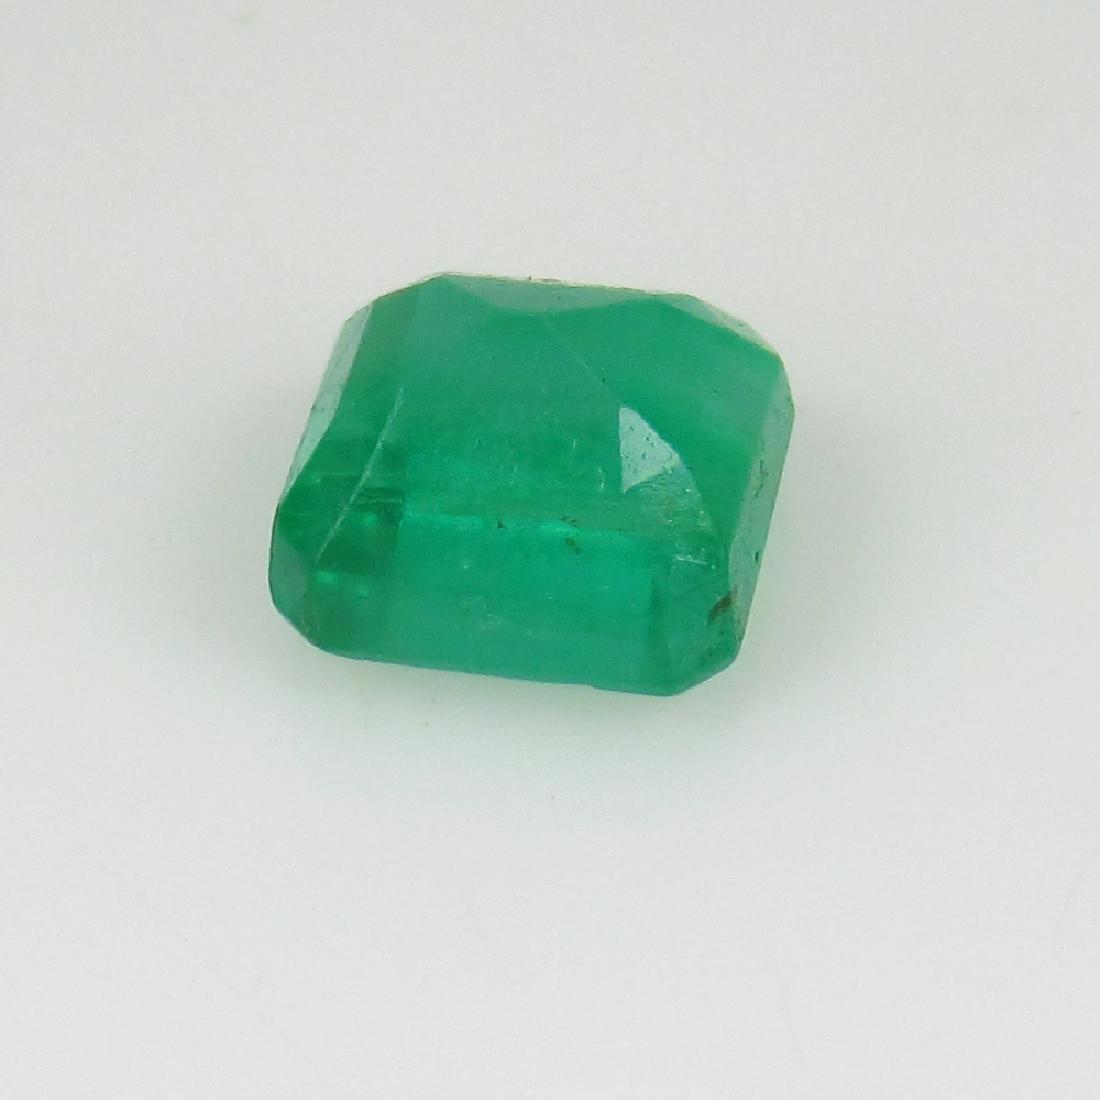 1.56 Ct IGI Certified Genuine Zambian Emerald Excellent - 5